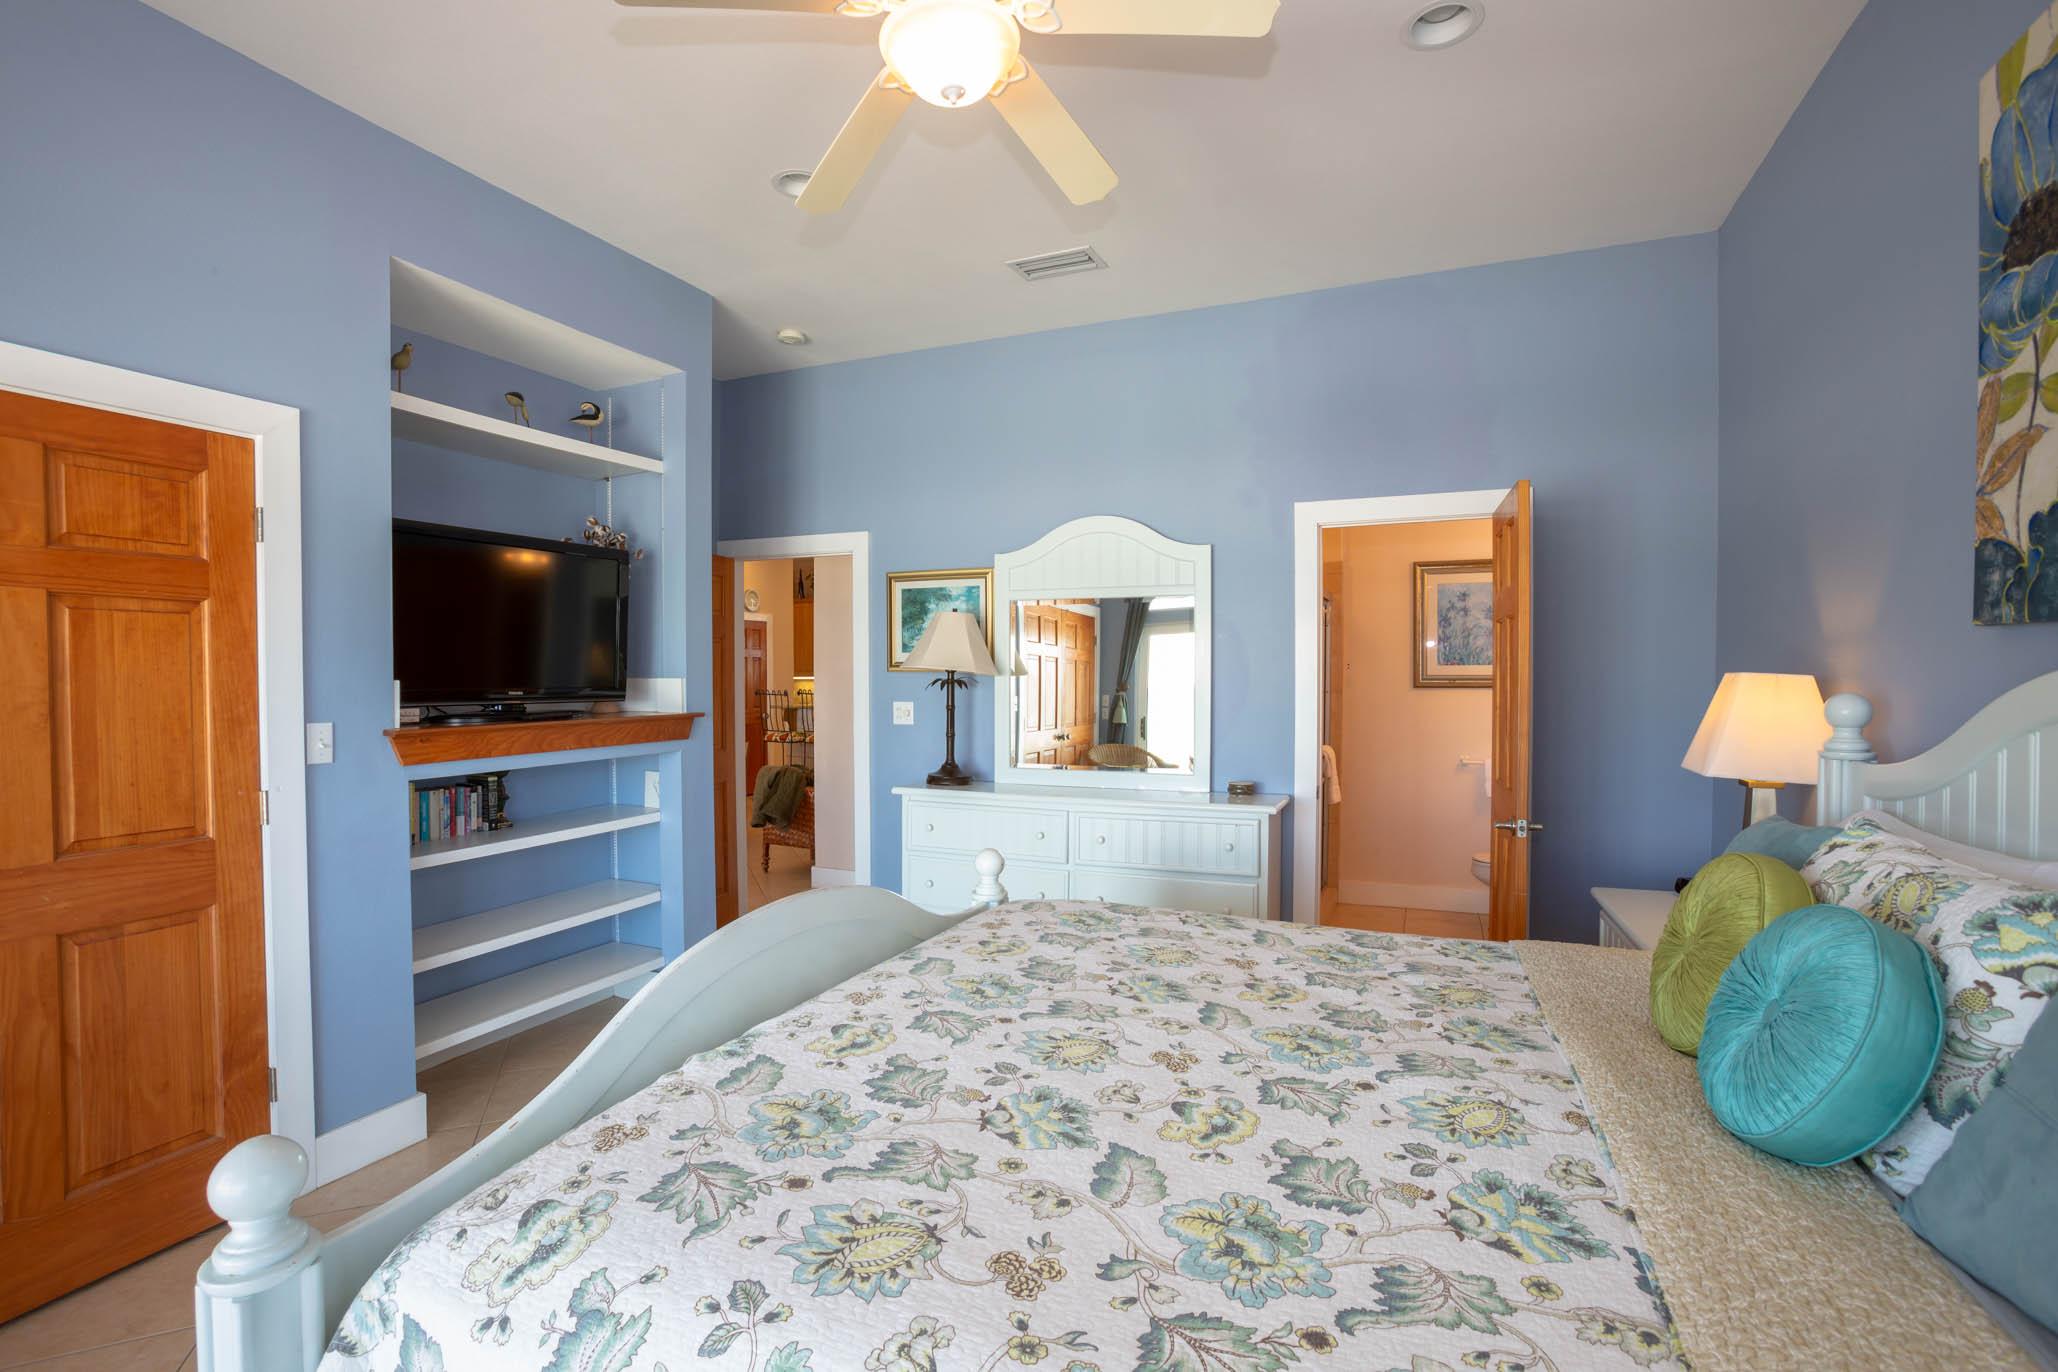 Ariola 1214 House/Cottage rental in Luxury Homes in Pensacola Beach Florida - #19